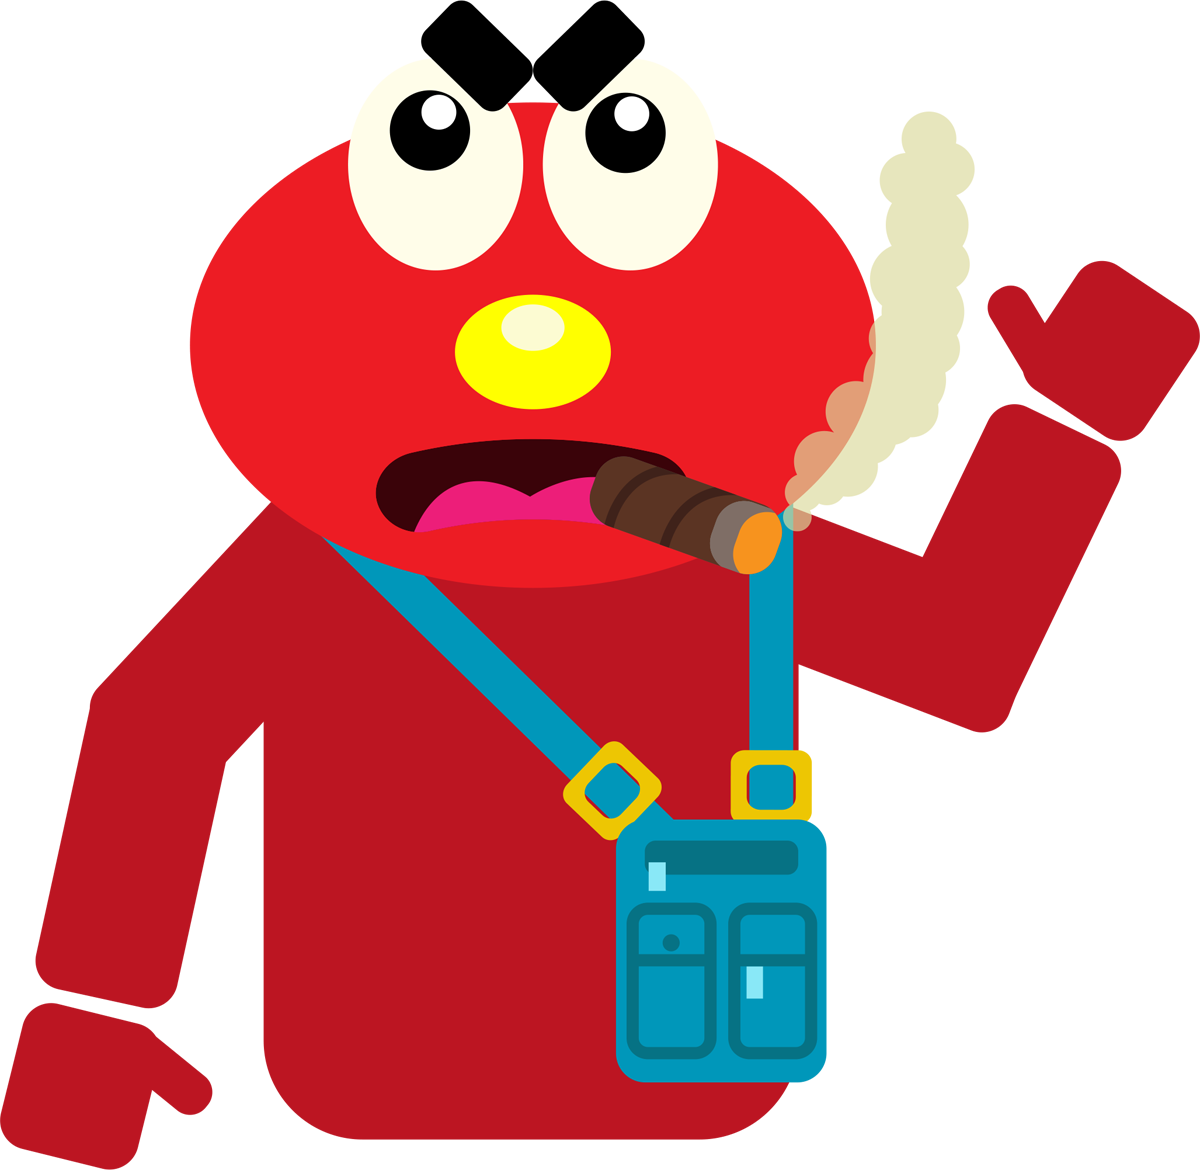 emoji clipart present